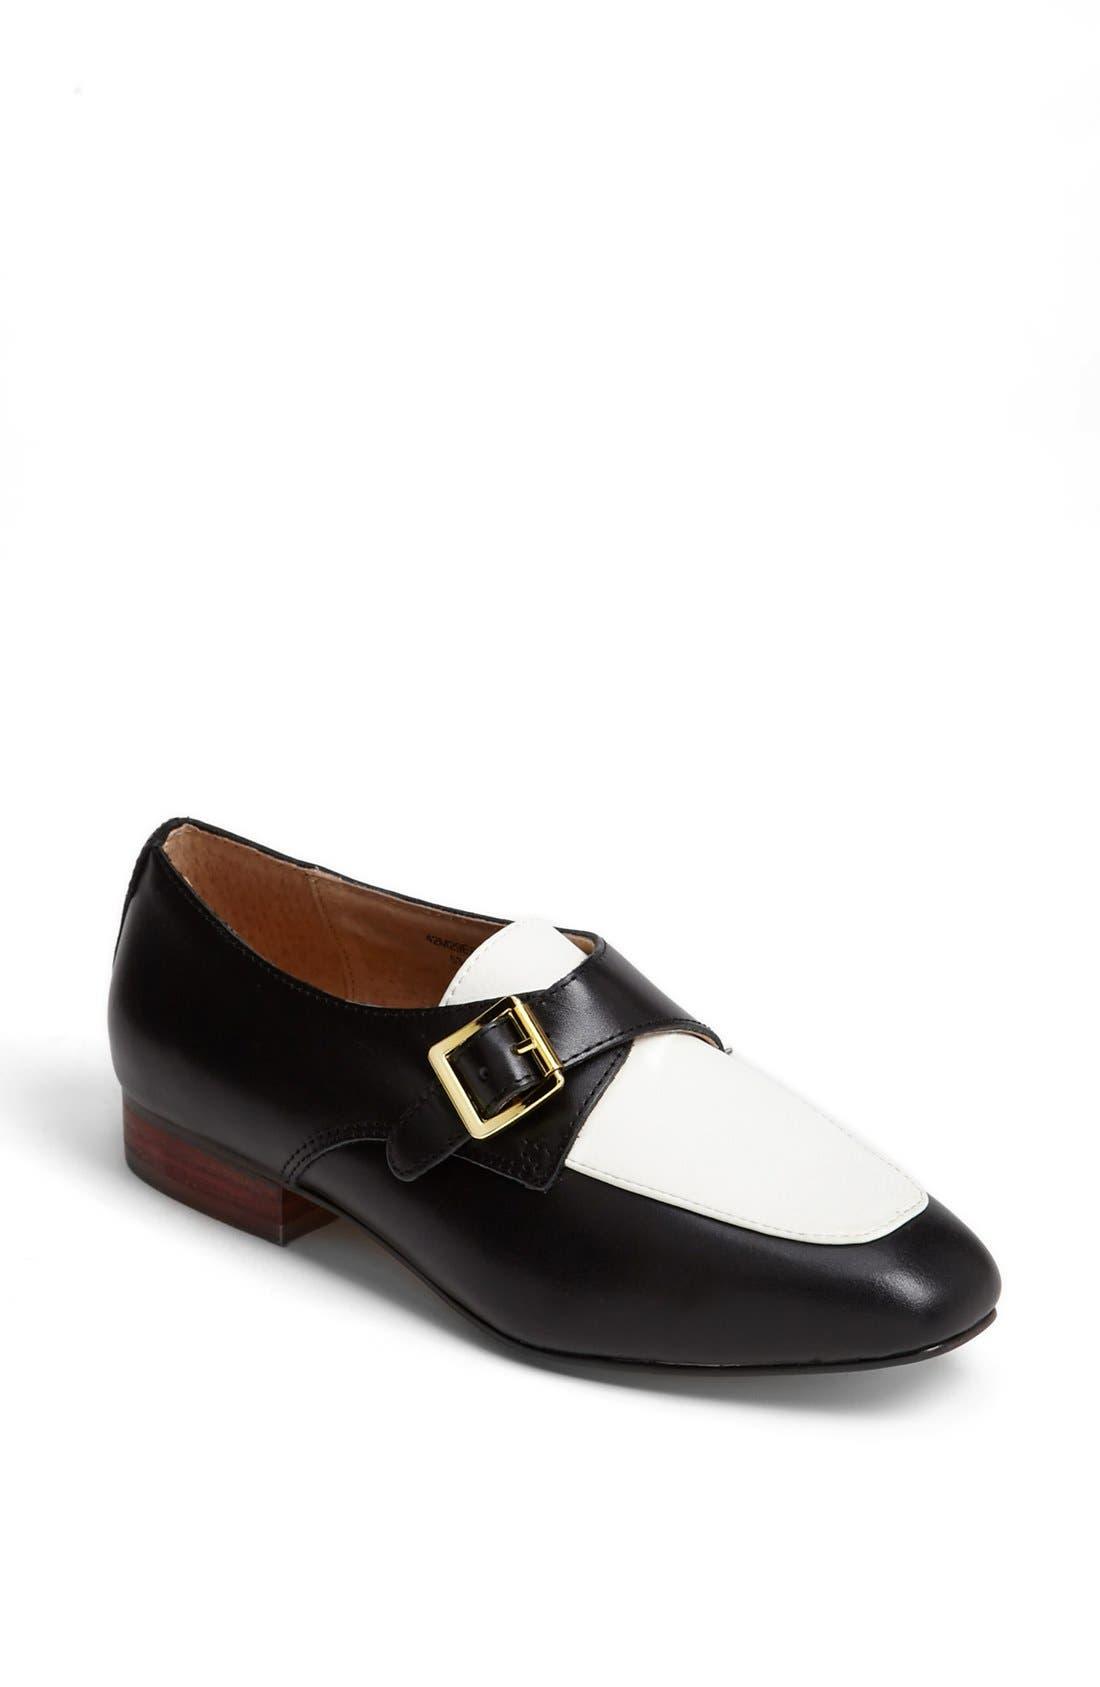 Alternate Image 1 Selected - Topshop 'Matie' Monk Strap Shoe